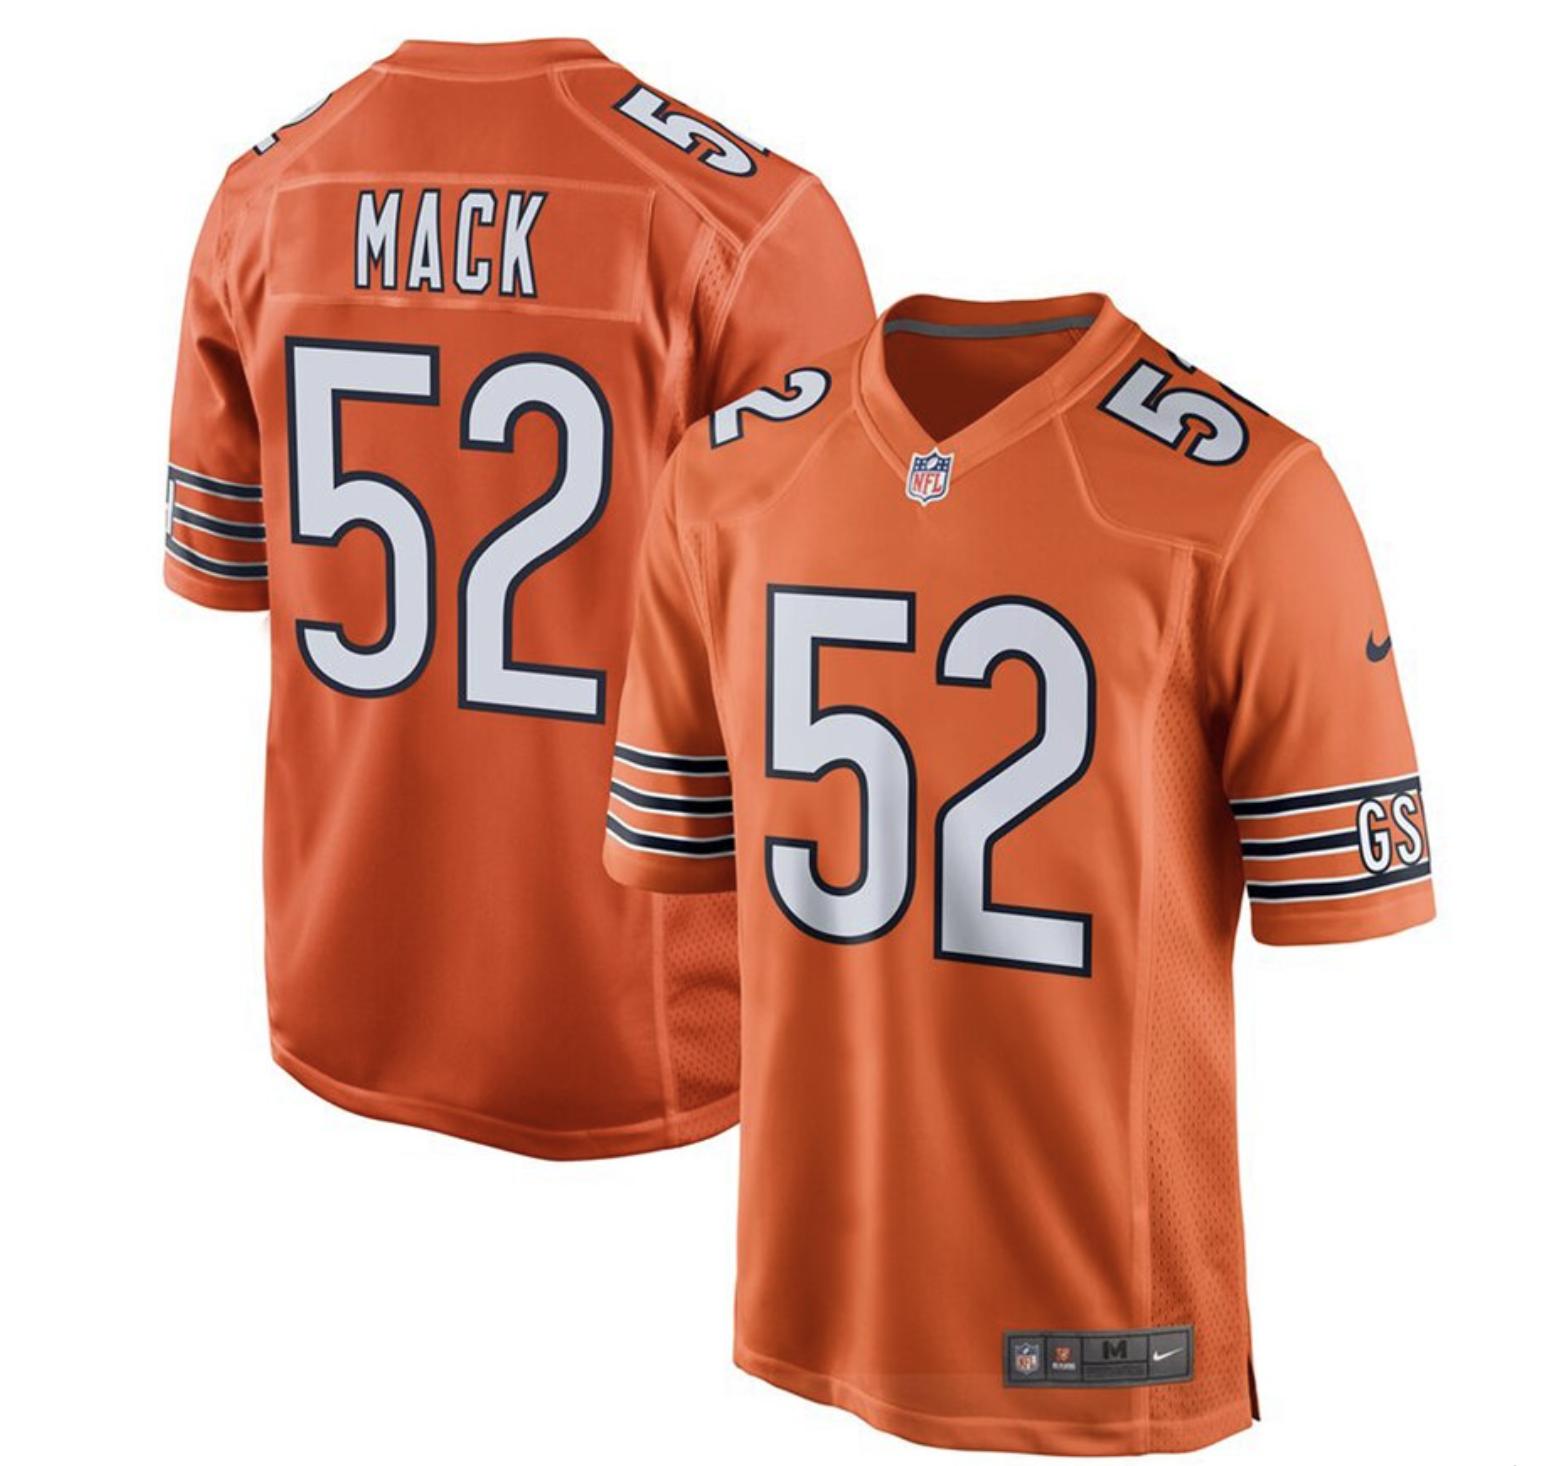 Khalil Mack Orange Youth Jersey Chicago Bears Chicago Bears Game Chicago Bears Jersey